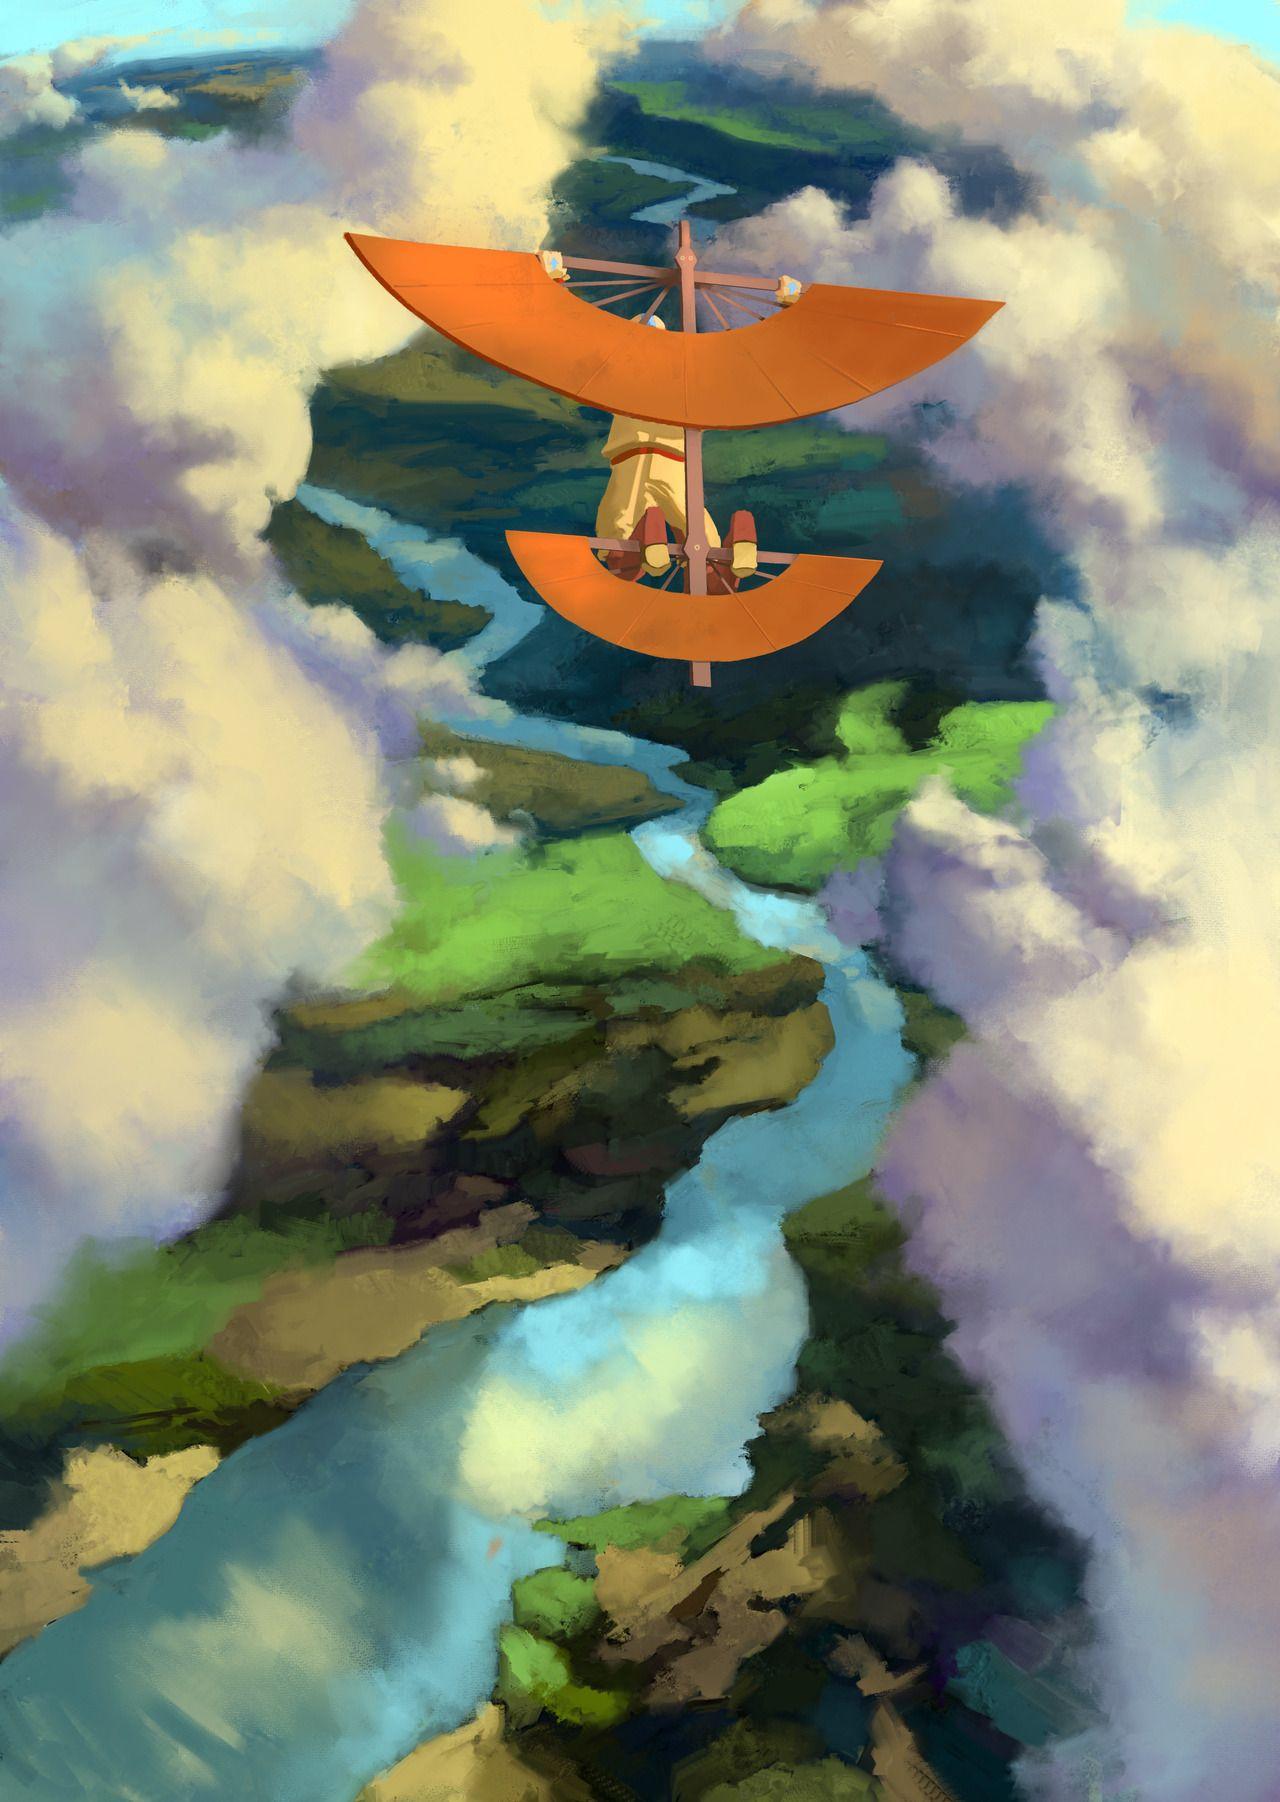 Avatar Le Dernier Maitre De L Air Wallpaper The Last Airbender Coin S Art Dump Avatar Dessin Anime Korra